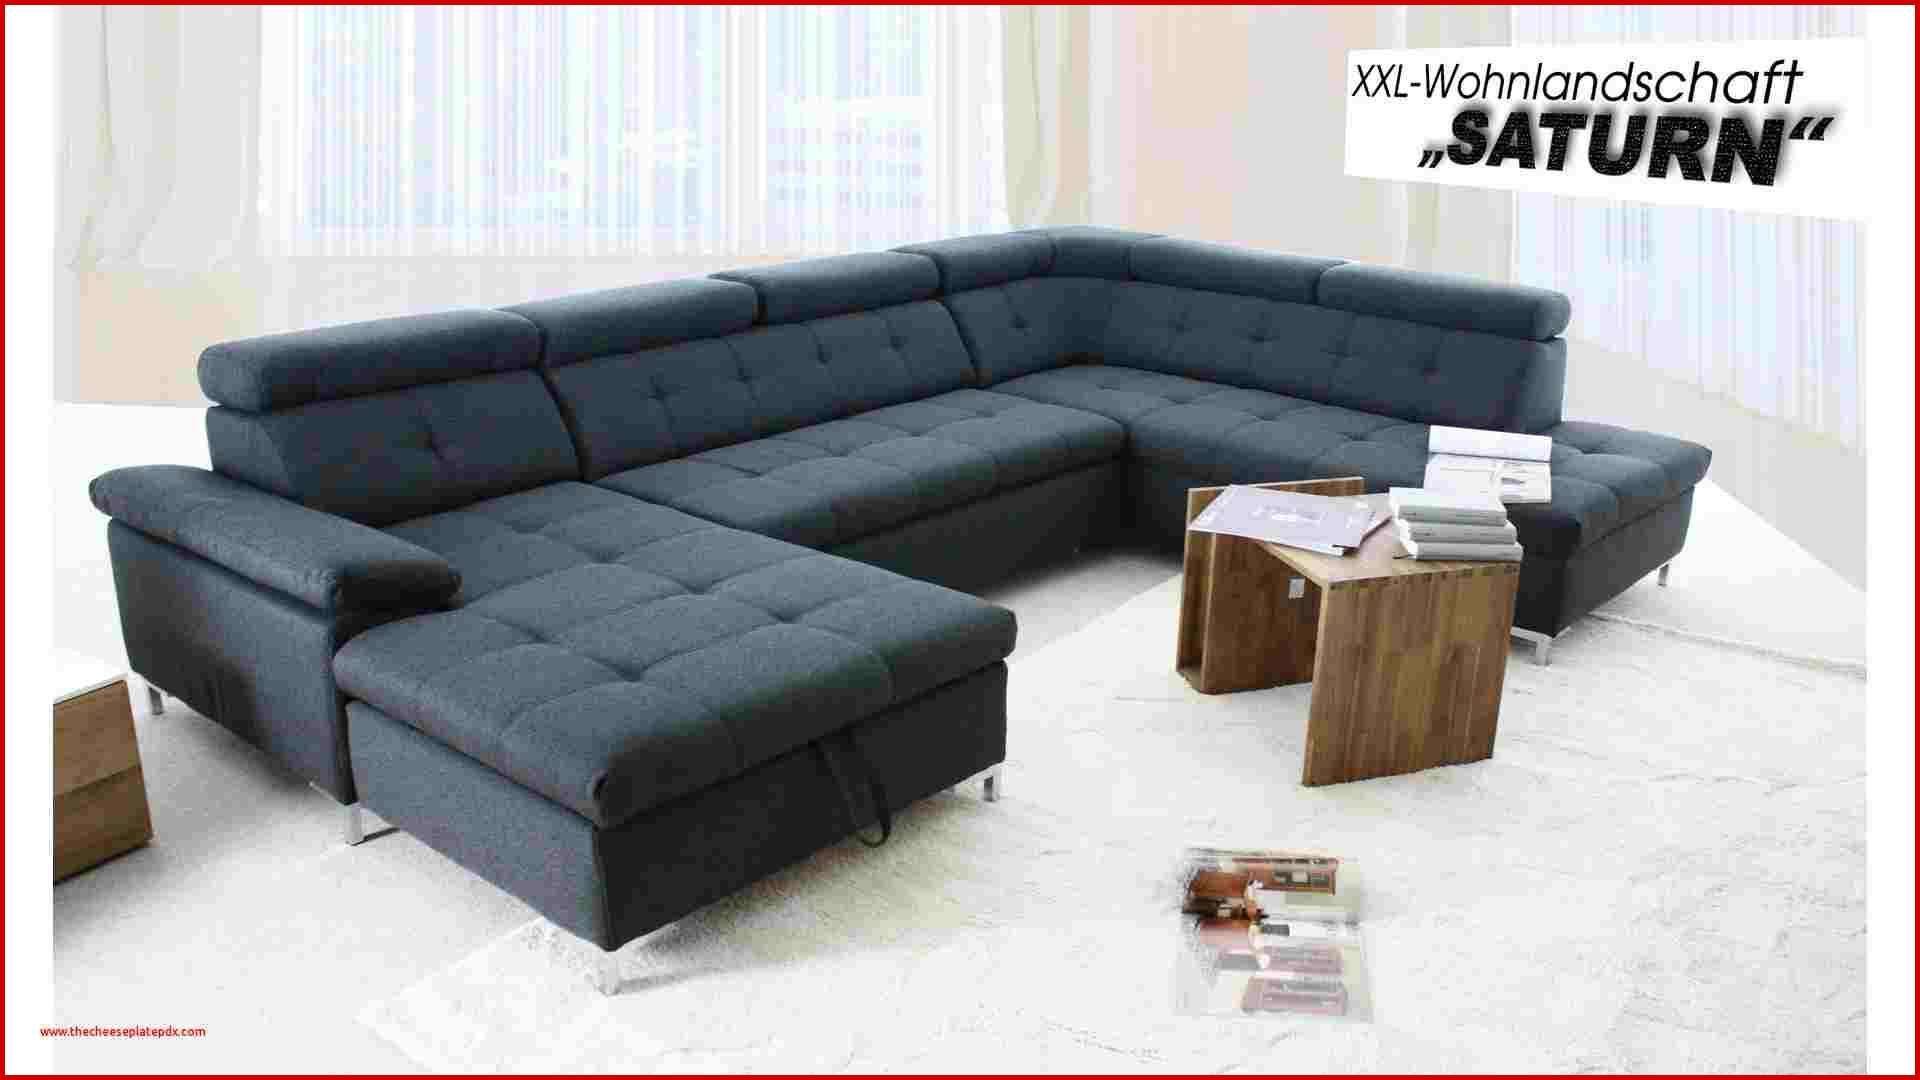 Wohnlandschaft Weiss Braun Big Sofa Xxl Lutz In 2020 Home Decor Home Decor